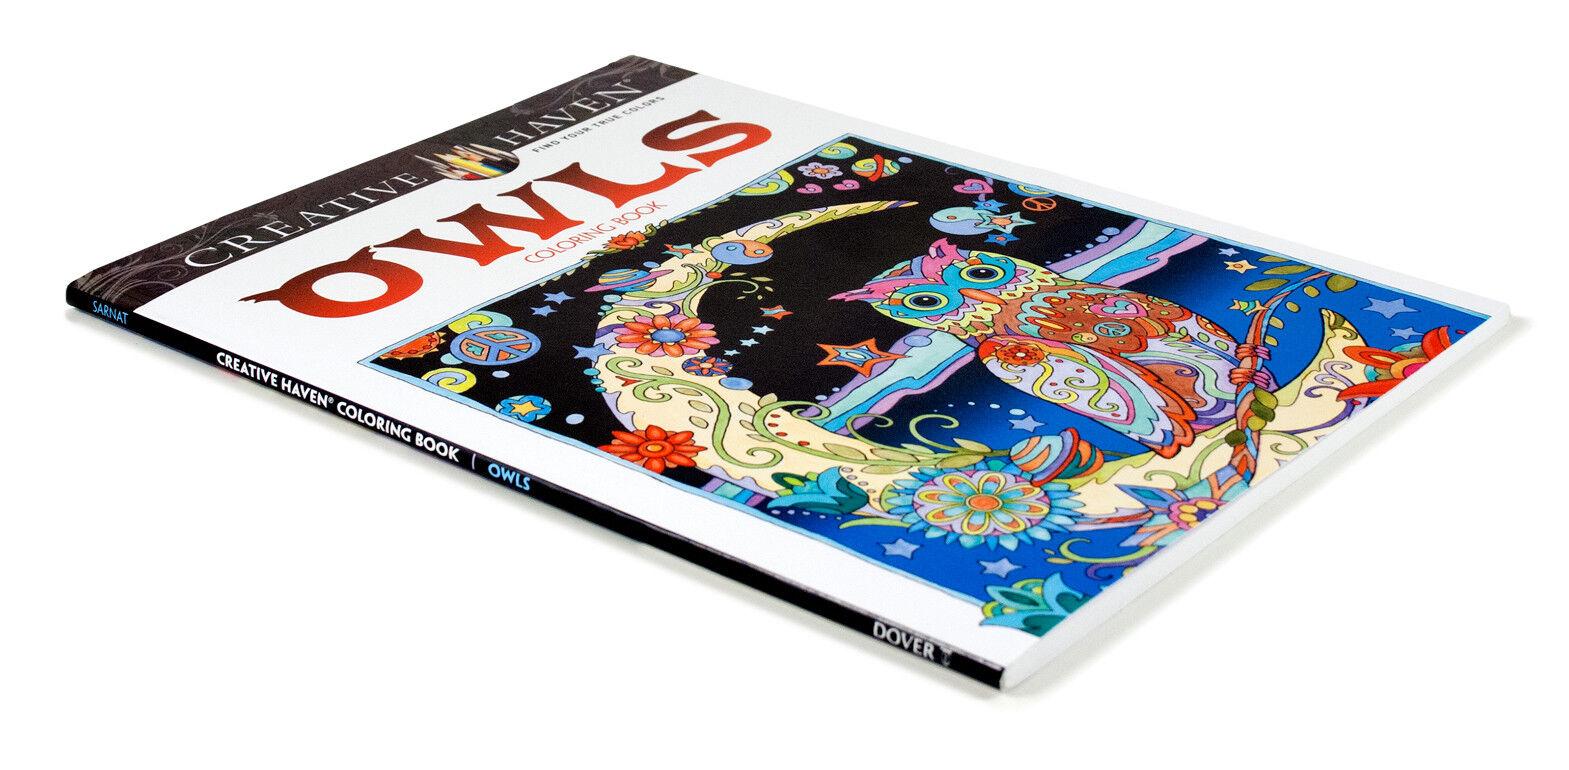 Creative Haven Owls Coloring Book By Marjorie Sarnat Paperback